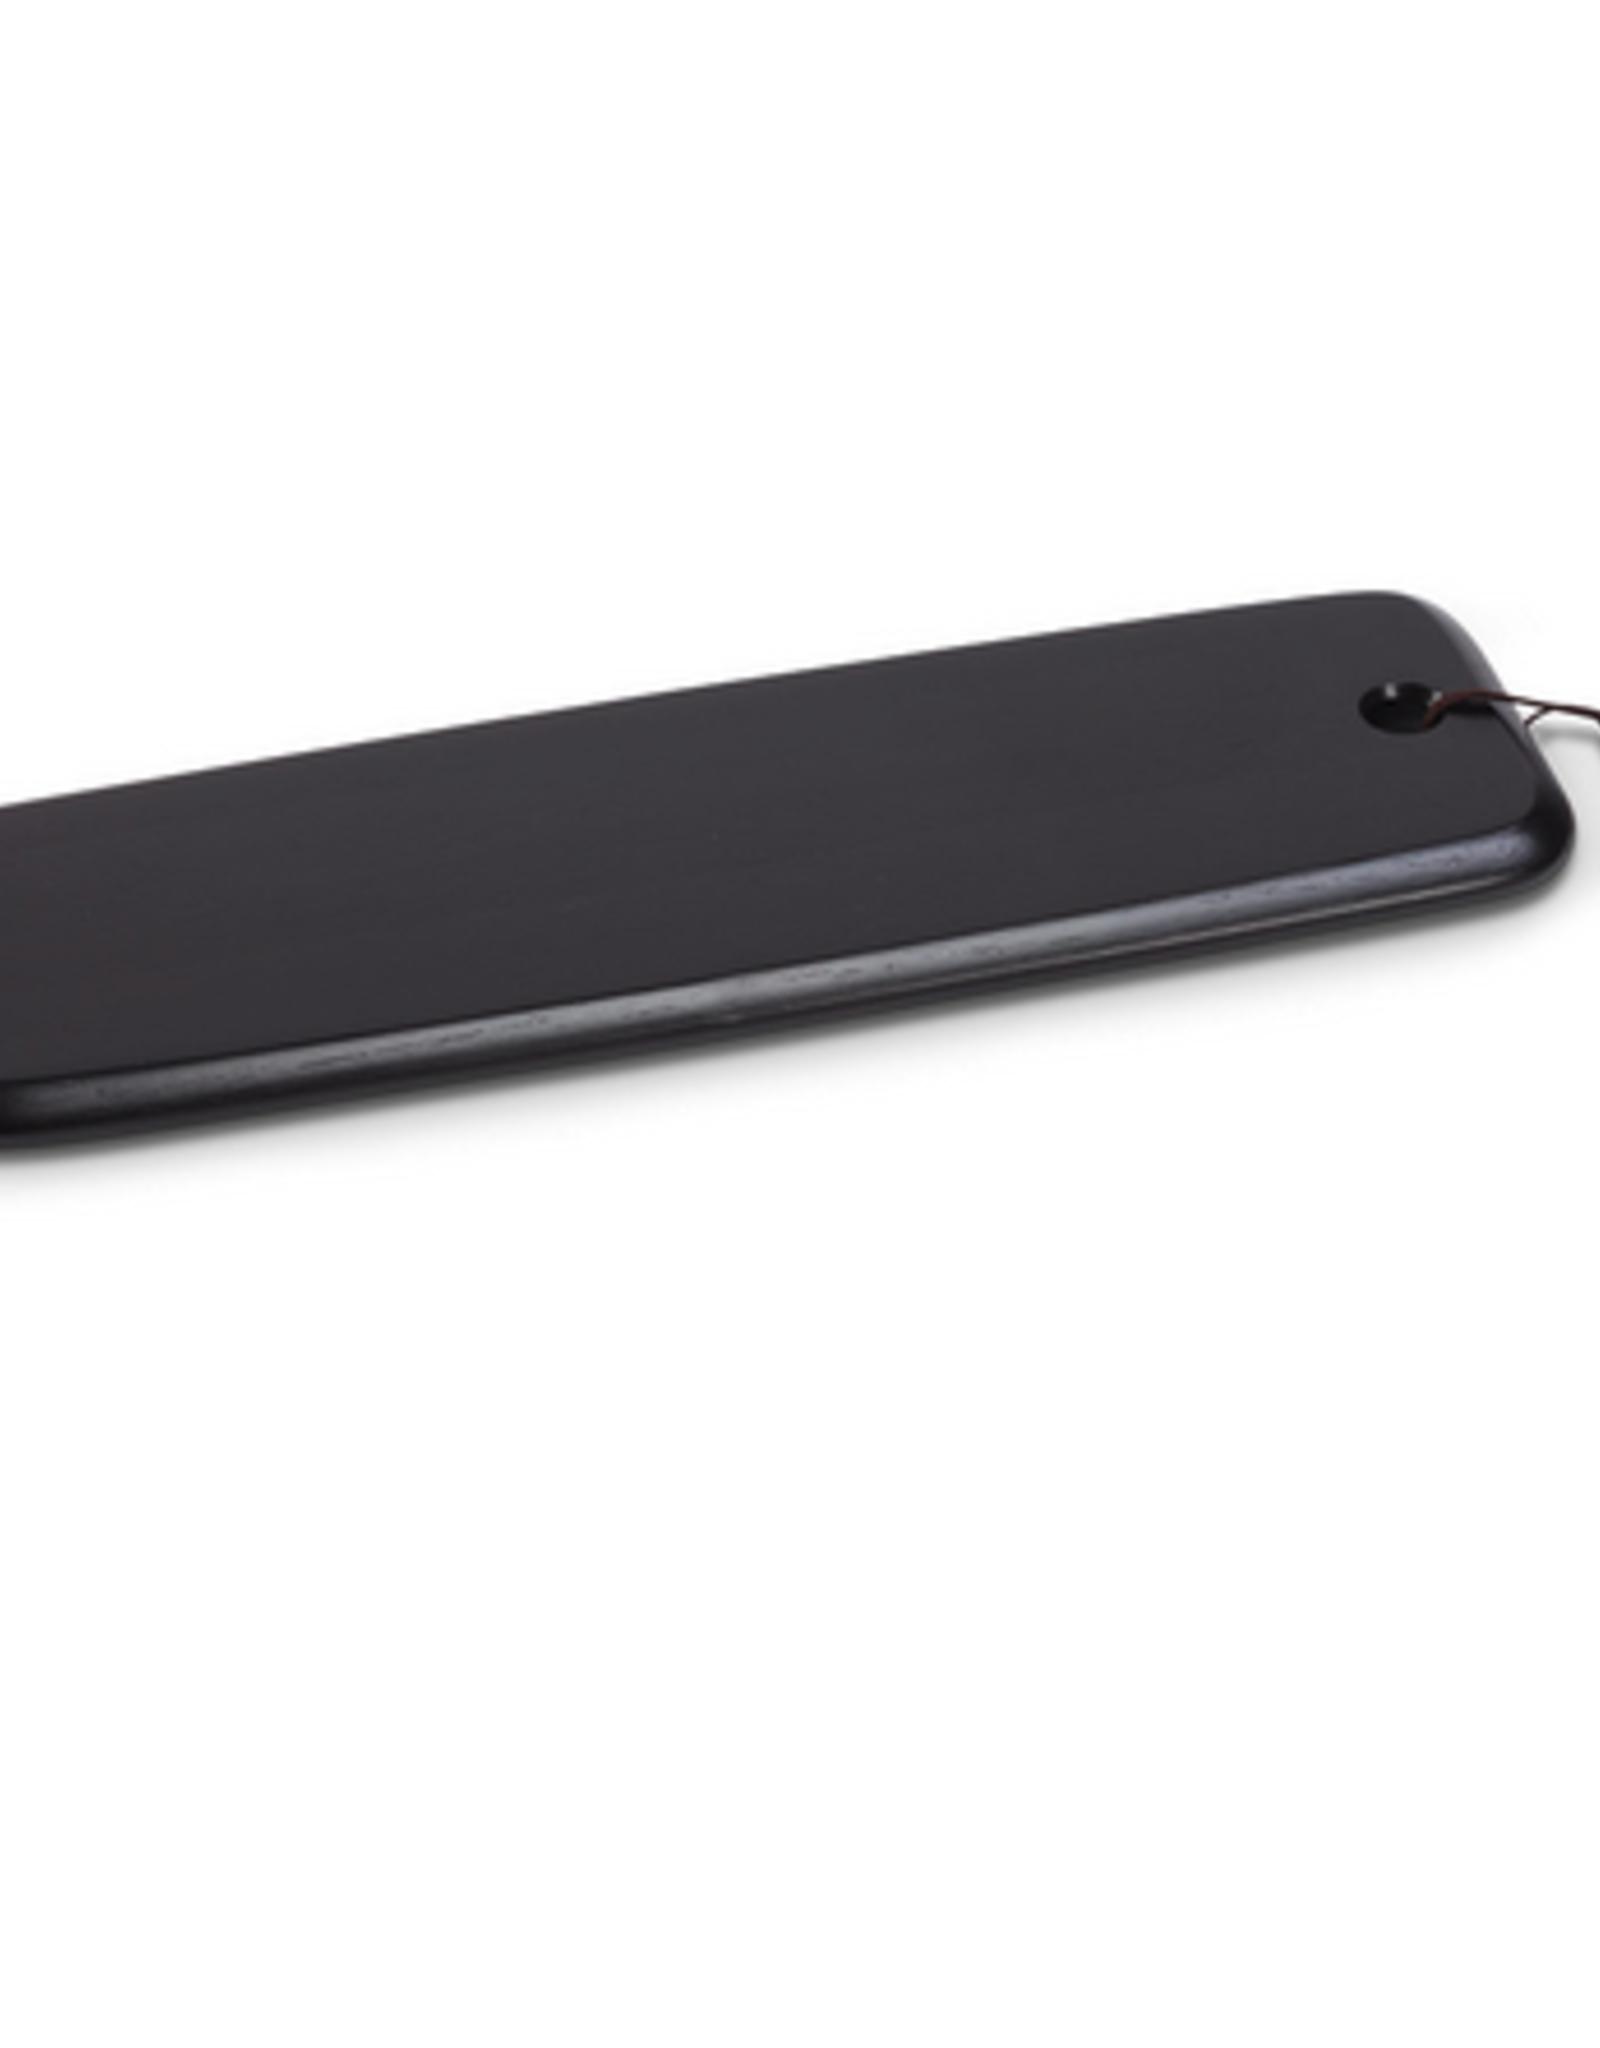 "Large Matte Black Slim Board with Strap W6.5"" L26"""